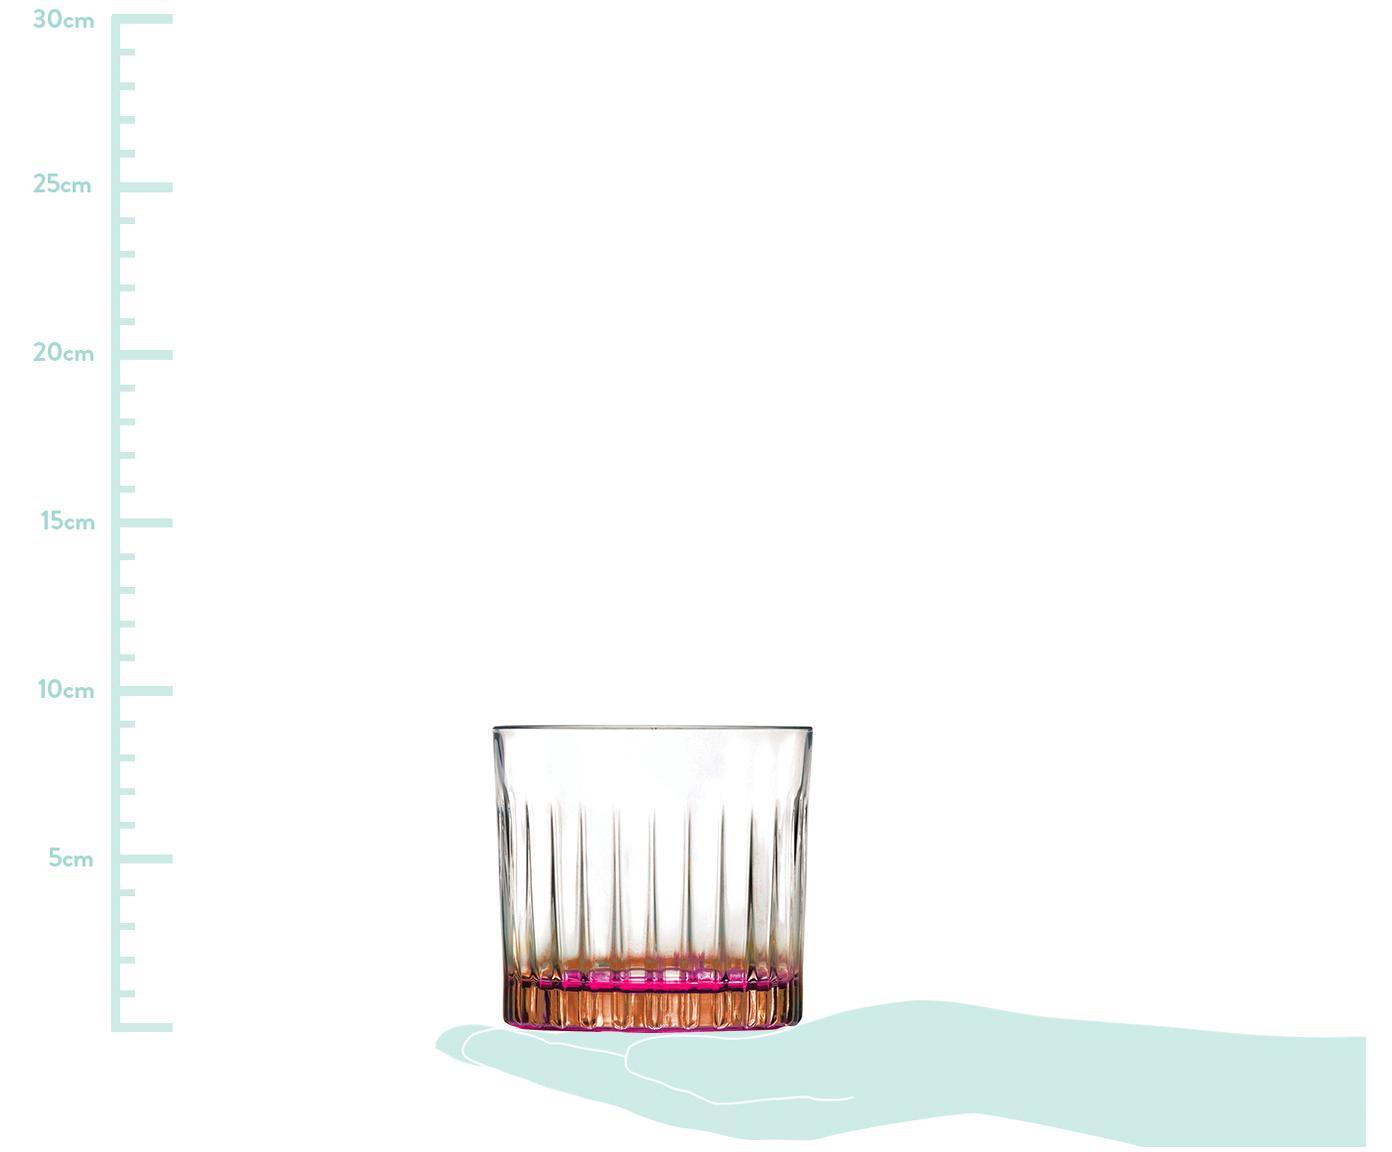 Kristallen tumblers Gipsy, 6 stuks, Luxion-kristalglas, Transparant, koperkleurig, roze, Ø 8 x H 9 cm